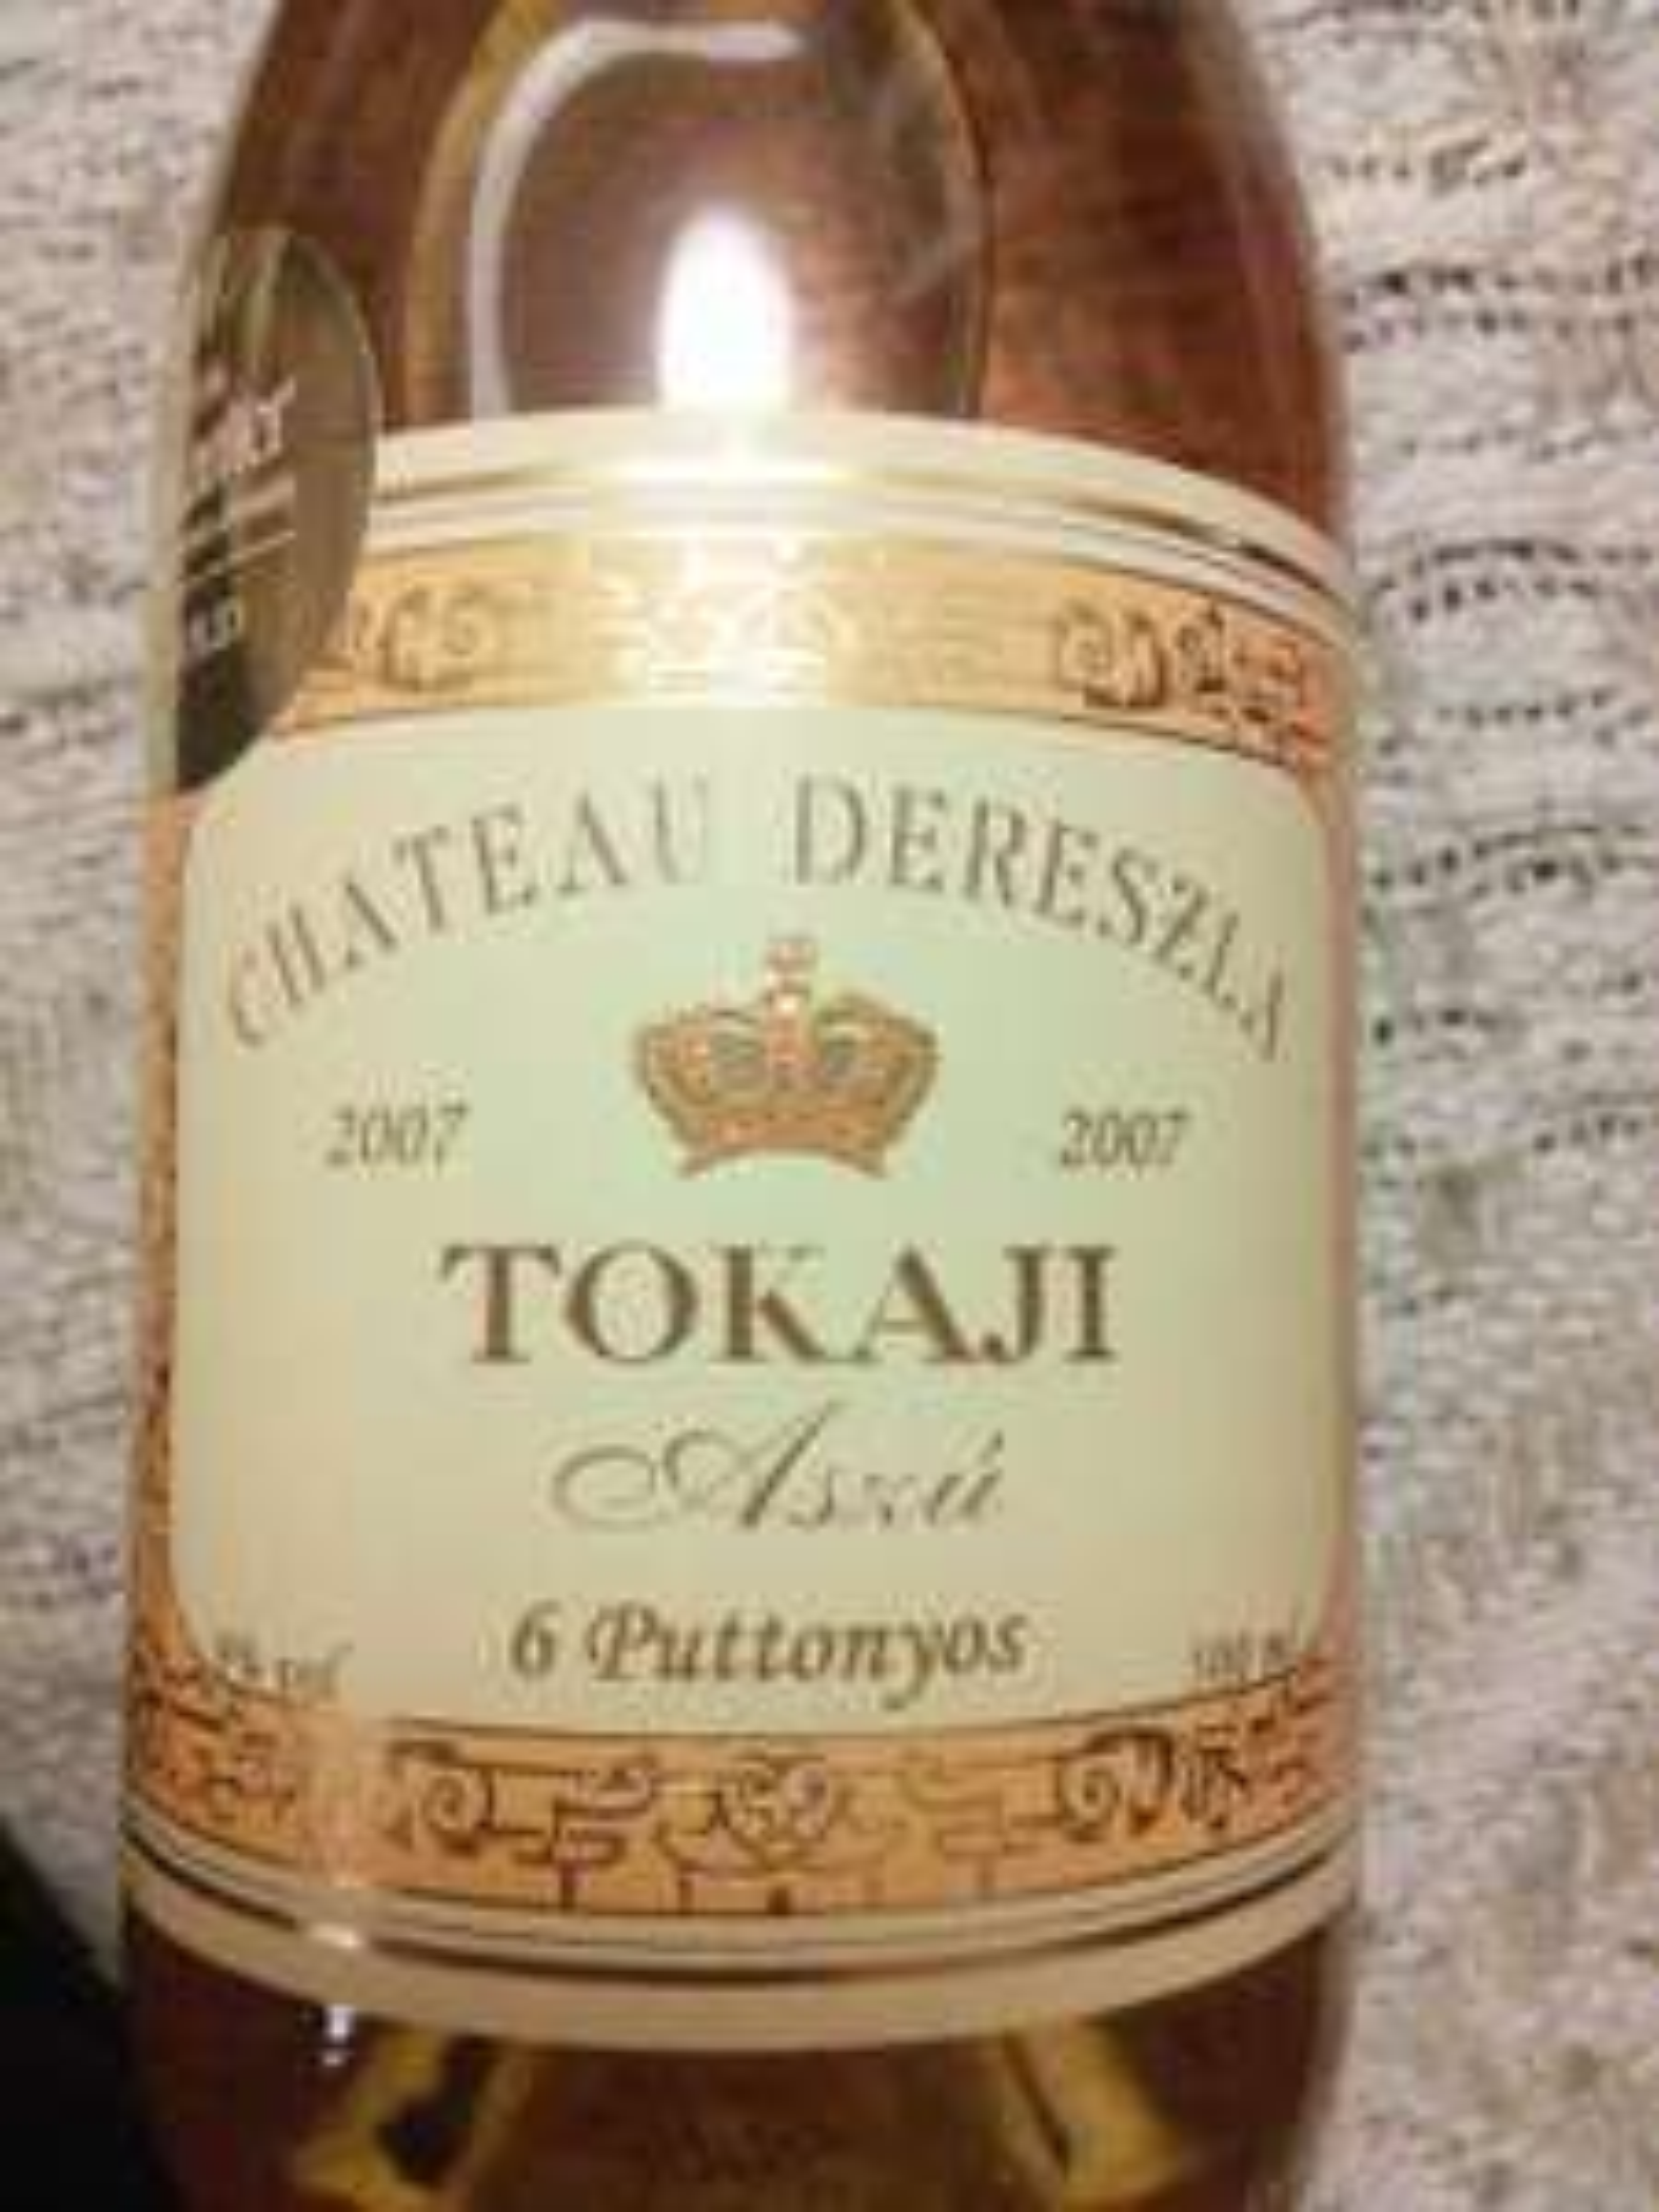 Chateau Dereszla 2007 6 Puttonyos Tokaji, 500ml £9.99 reduced from £19.99 at Lidl